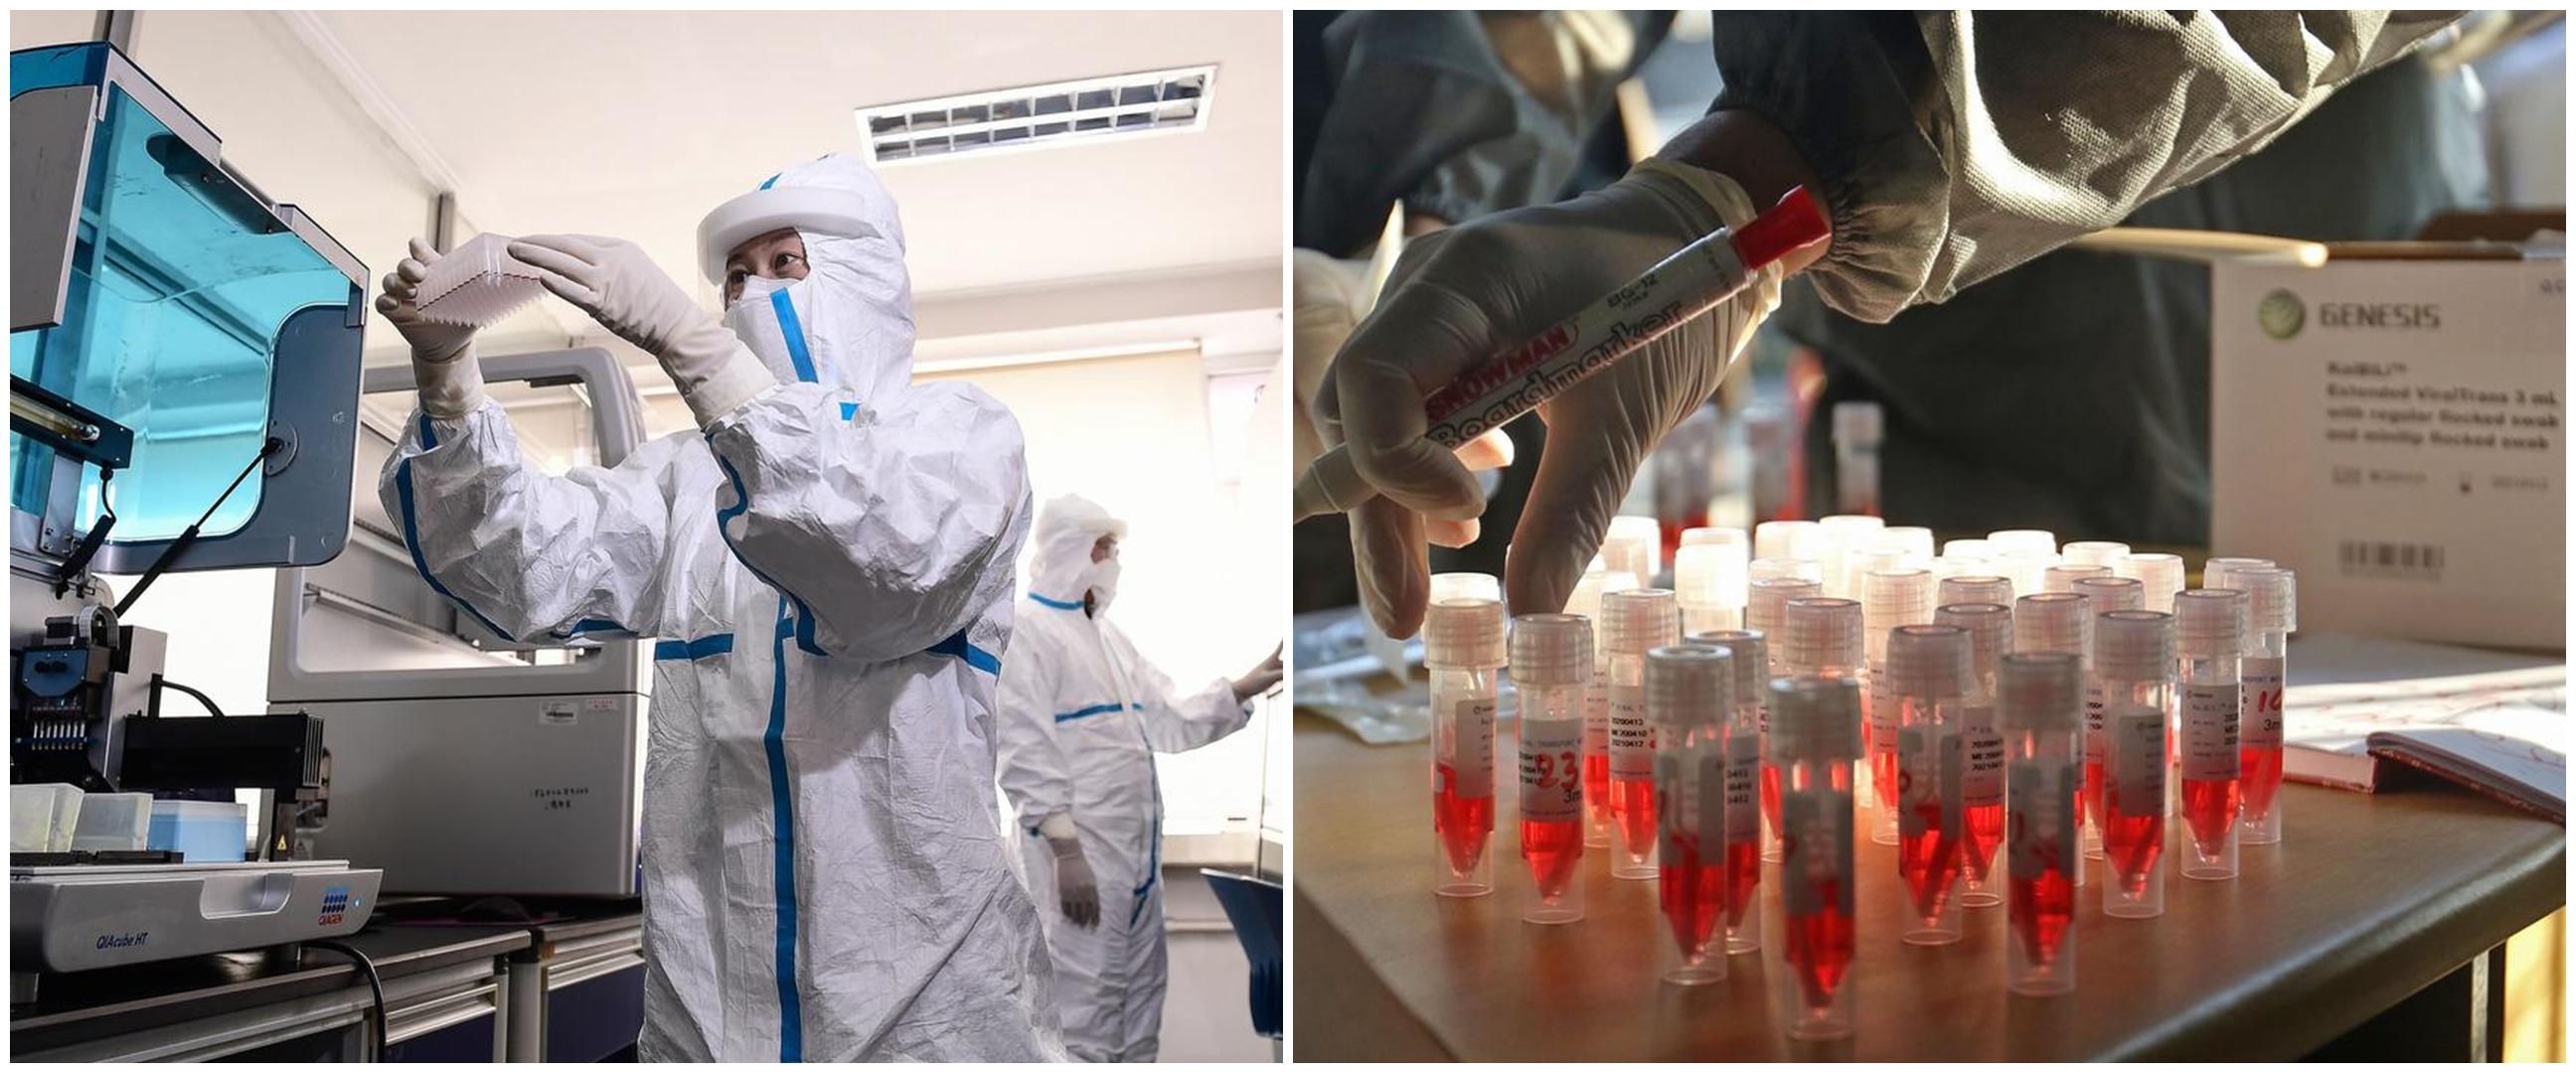 Kabar baik, antibodi virus corona telah ditemukan